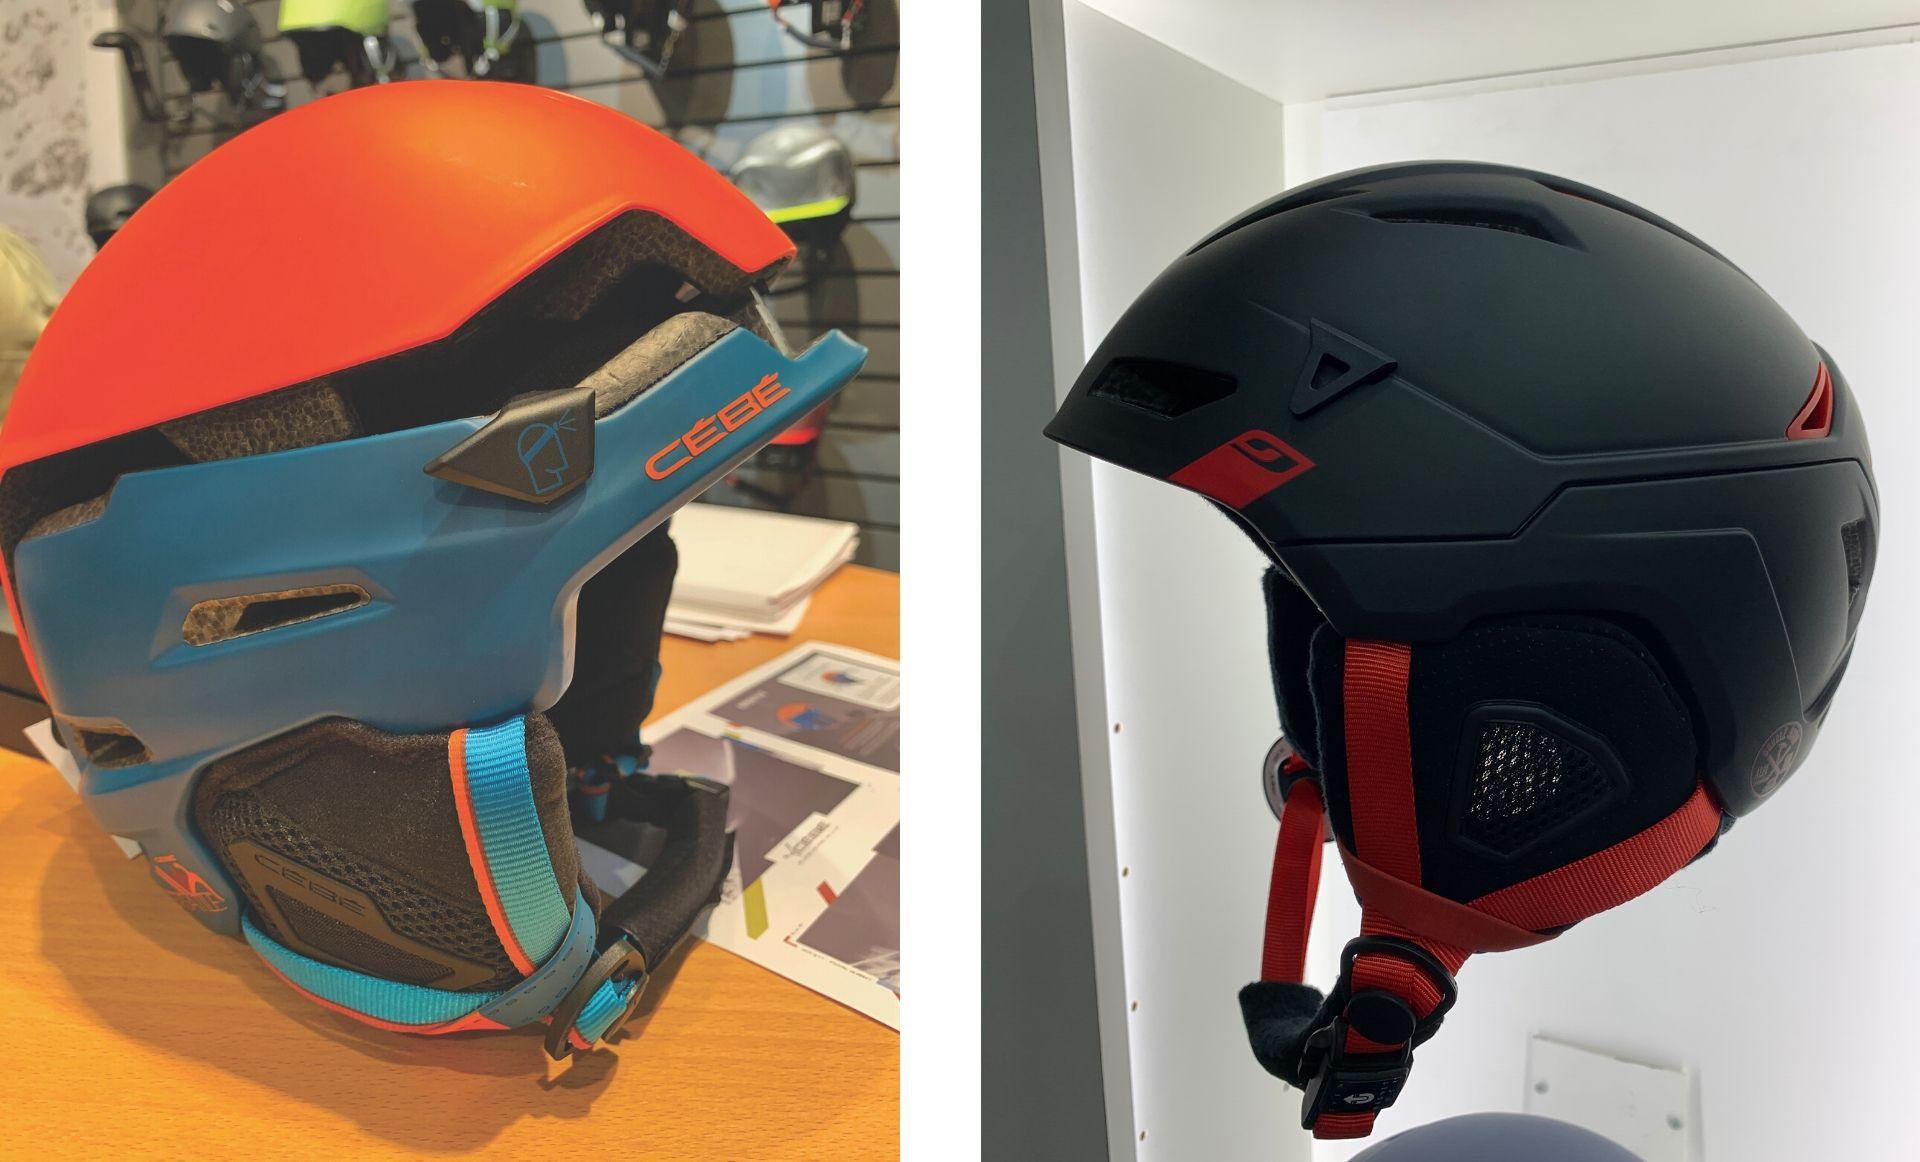 Best Ski Helmets 2021 WINTER 2021 – THE BEST NEW HELMETS AND EYEWEAR – Fall Line Skiing |